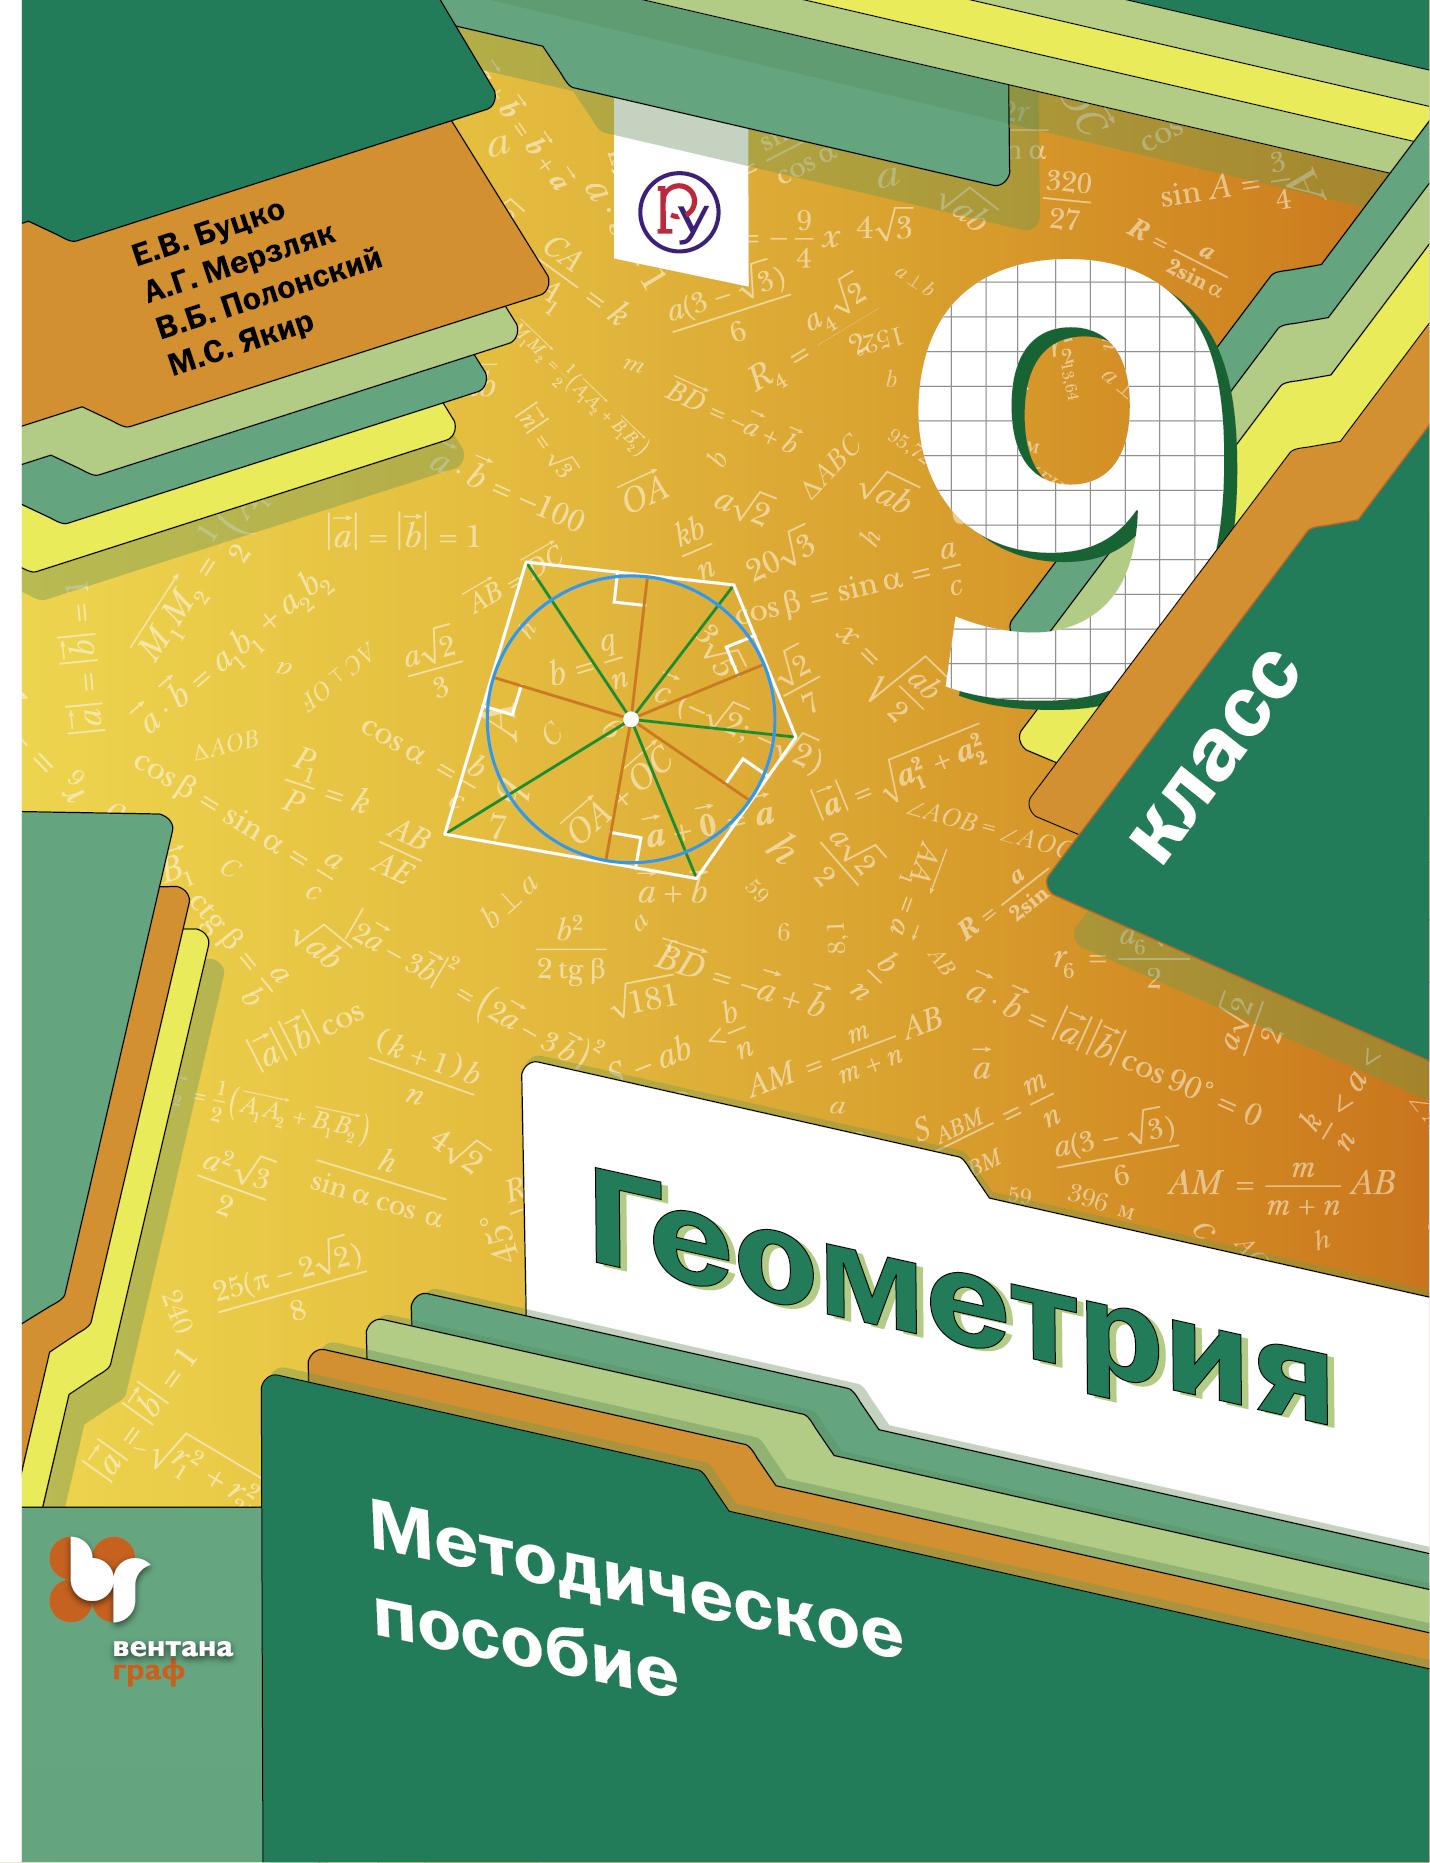 Геометрия. 9 класс. Методическое пособие. от book24.ru